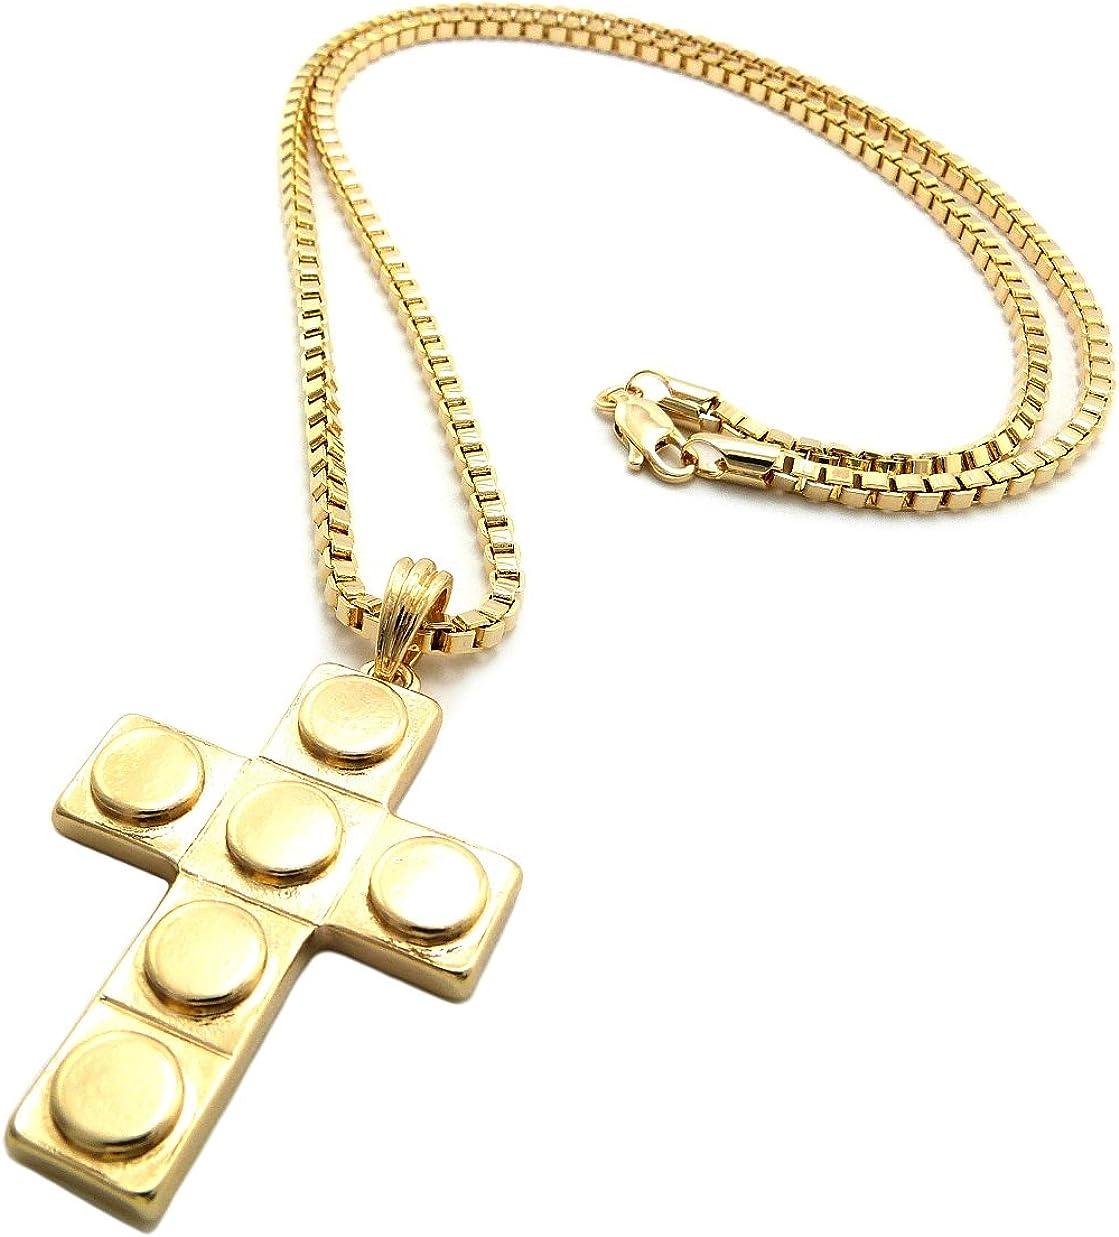 NYFASHION101 Toy Block Style Cross Micro Pendant 3mm 24 Box Chain Necklace